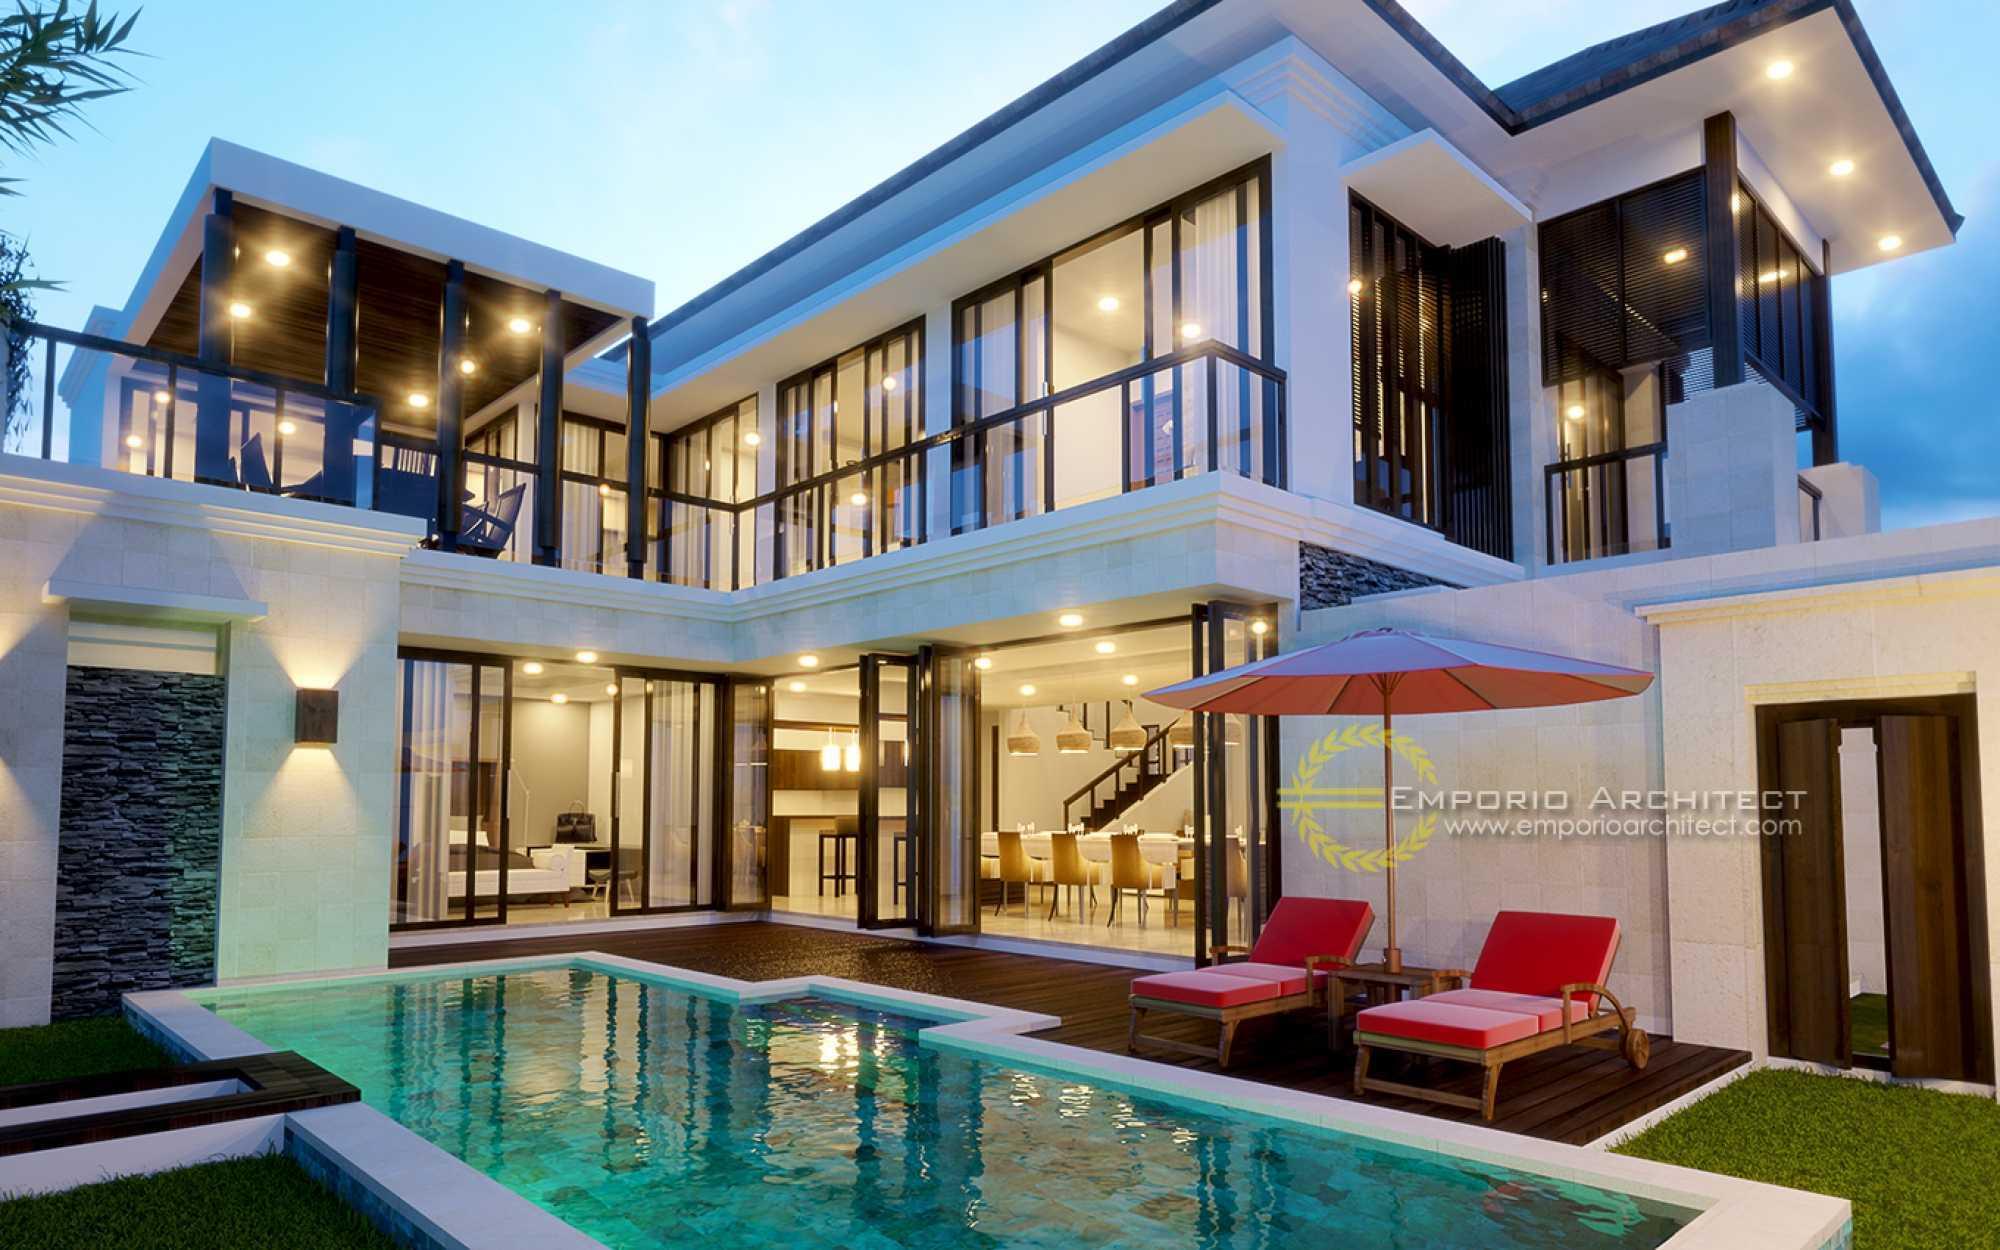 Emporio Architect Desain Rumah Villa Bali Tropis  244 @ Bekasi Bekasi, Kota Bks, Jawa Barat, Indonesia Bekasi, Kota Bks, Jawa Barat, Indonesia Emporio-Architect-Desain-Rumah-Villa-Bali-Tropis-244-Bekasi  73303